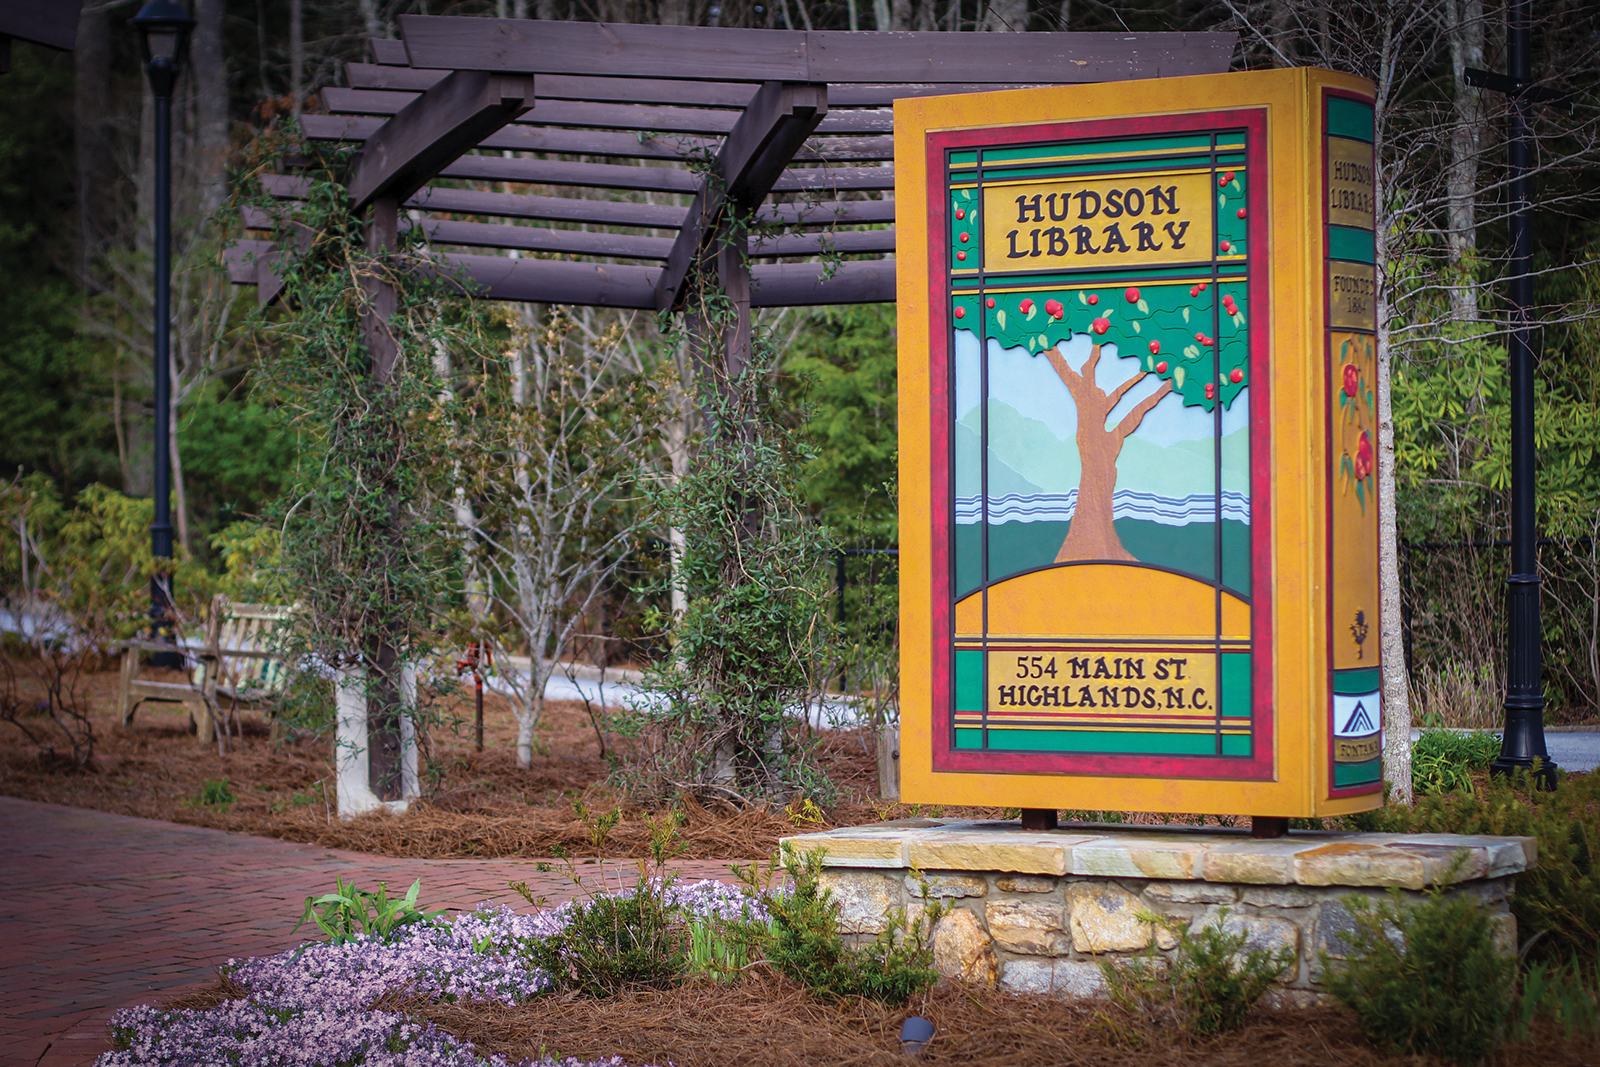 hudson_Library_highlands_North_Carolina